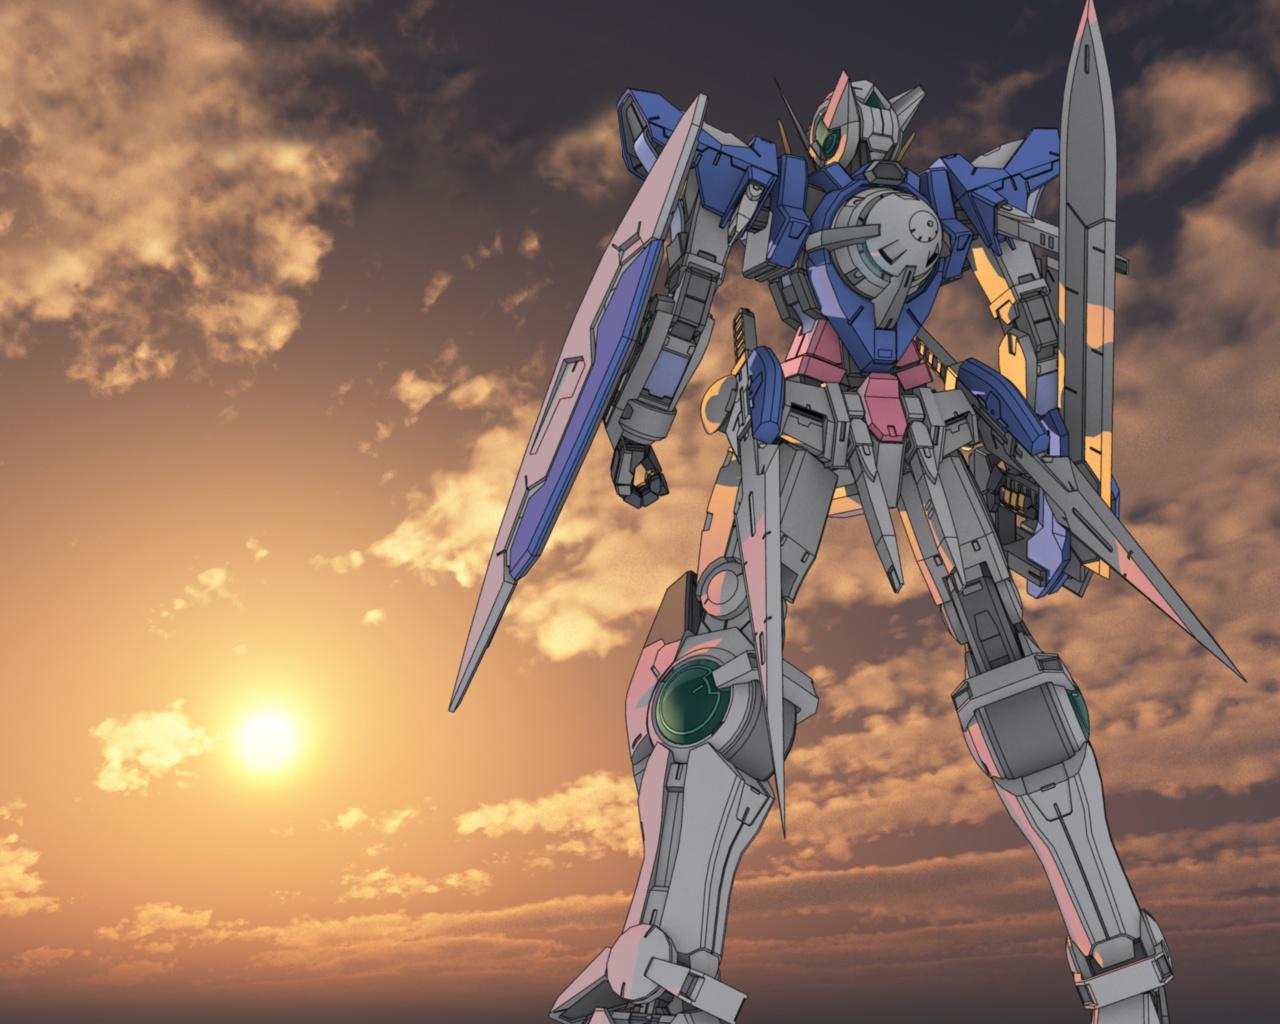 Free Download Mobile Suit Gundam 00 Gn 001 Gundam Exia Sun